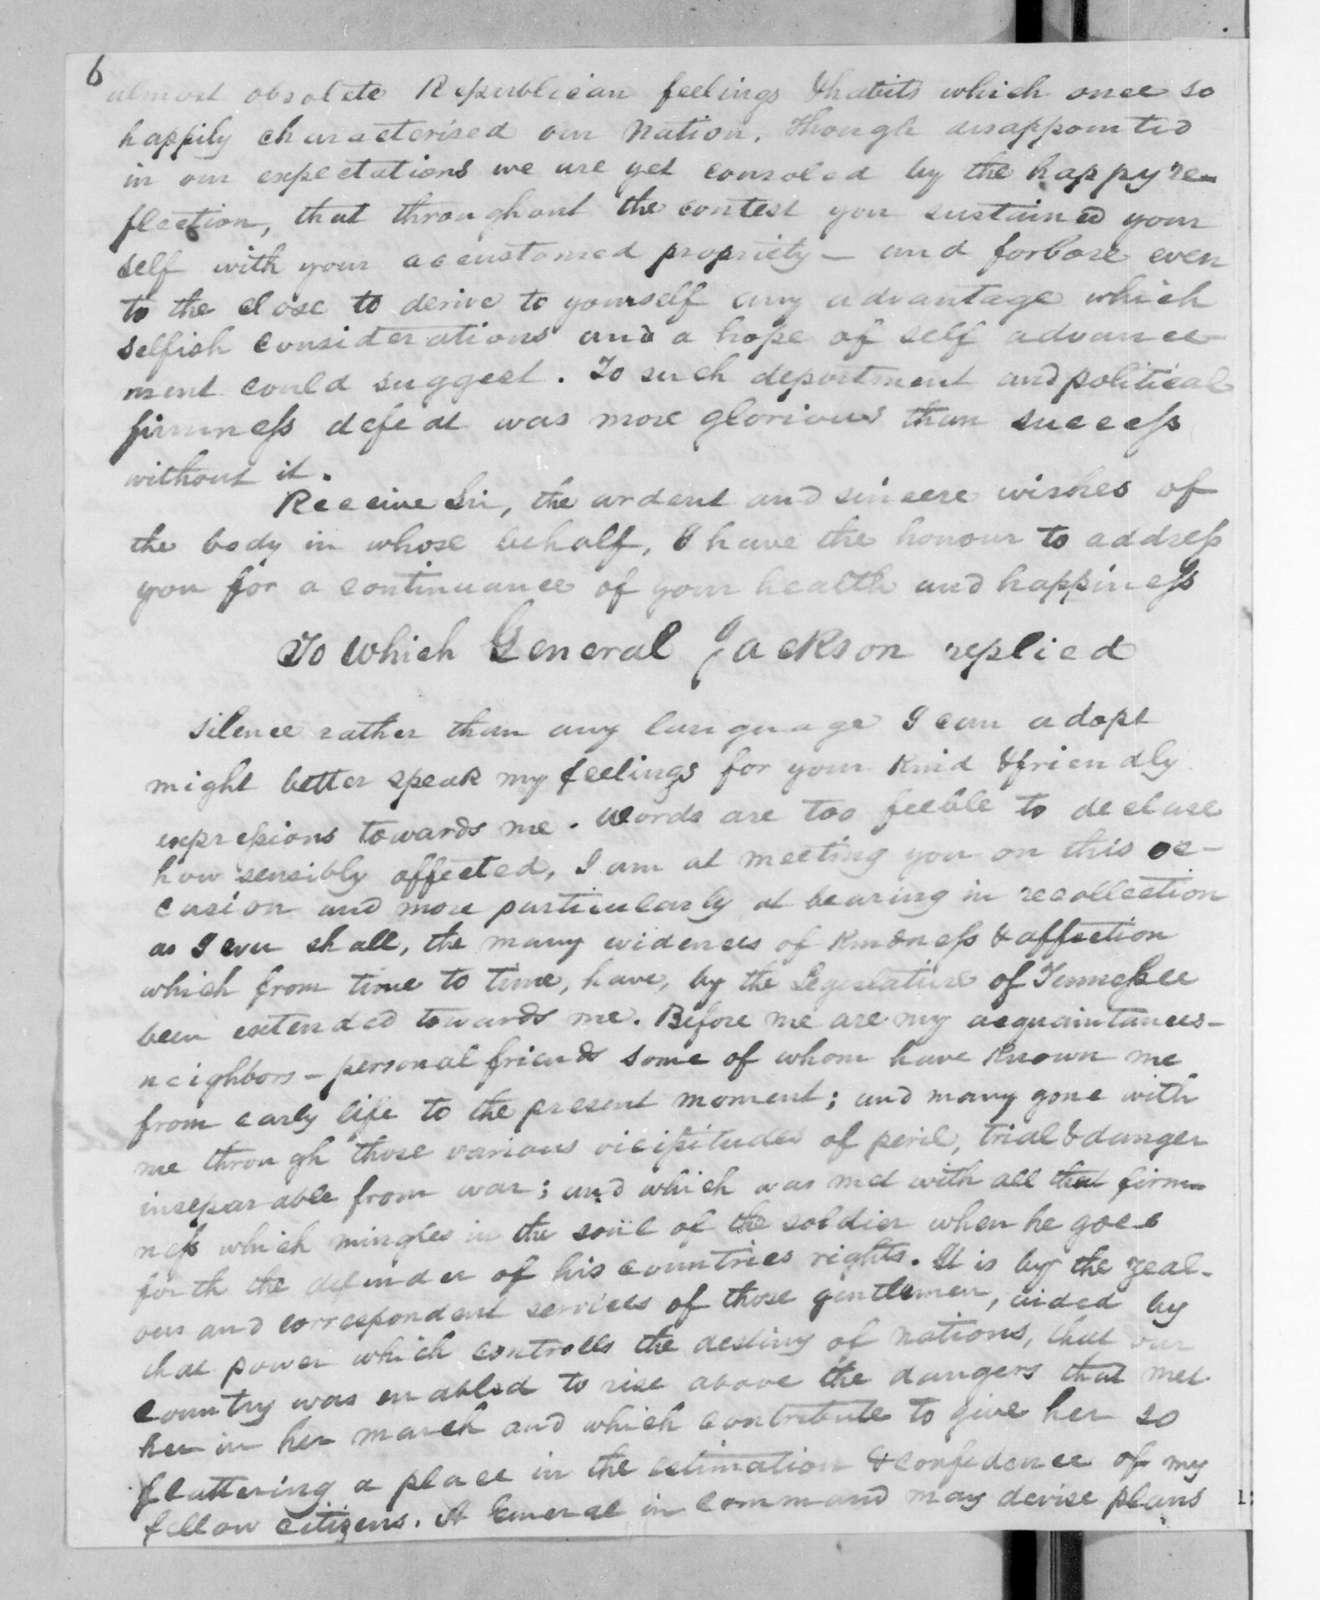 Benjamin Franklin Currey to Andrew Jackson Donelson, October 12, 1825